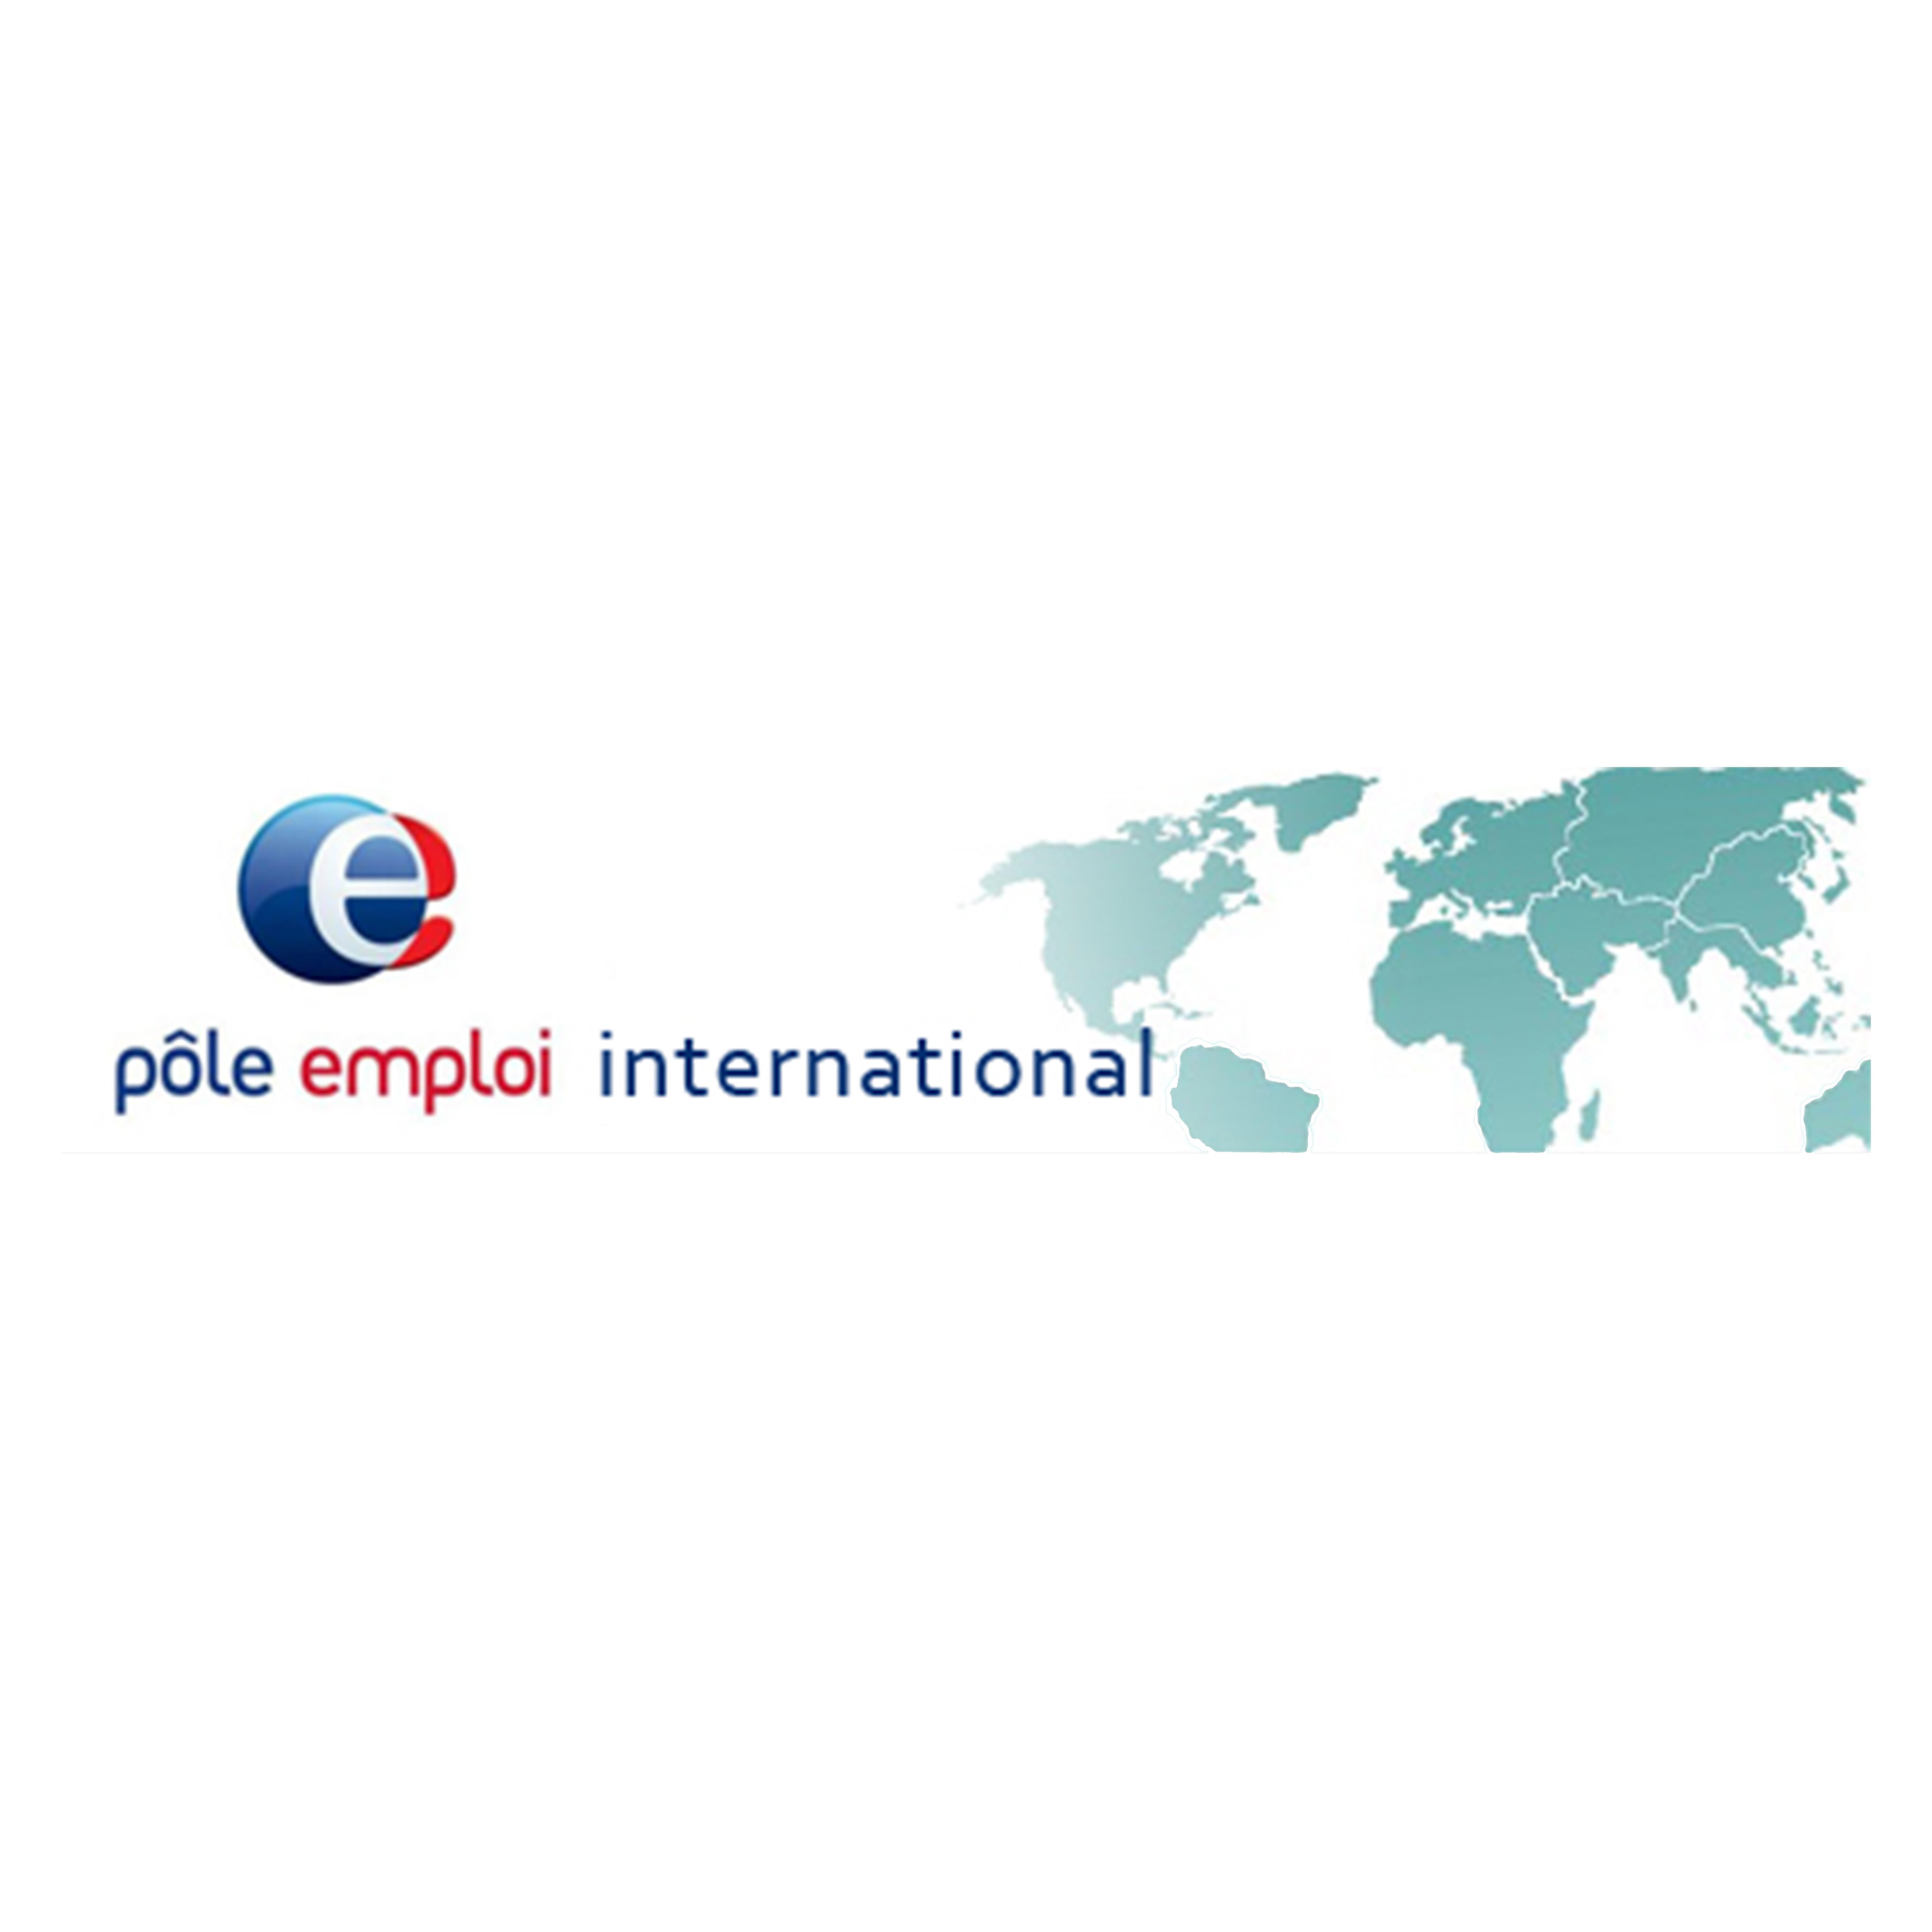 Pôle emploi international